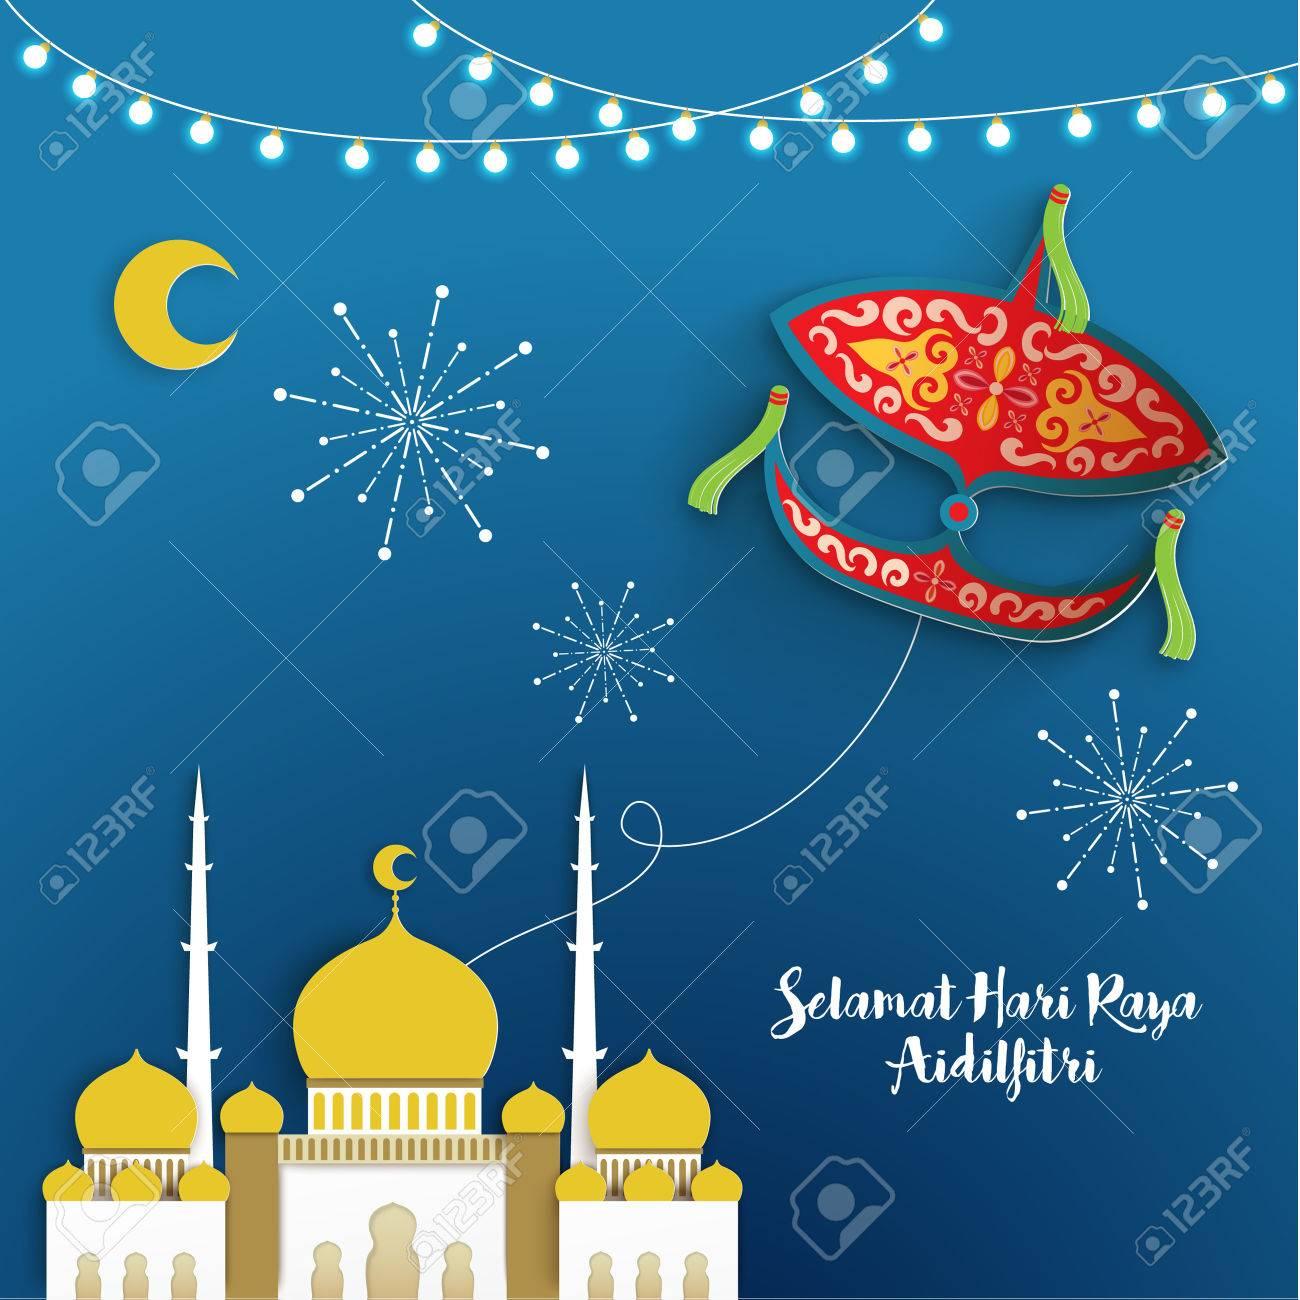 Eid al fitr celebration greeting vector design illustration royalty eid al fitr celebration greeting vector design illustration stock vector 62025158 m4hsunfo